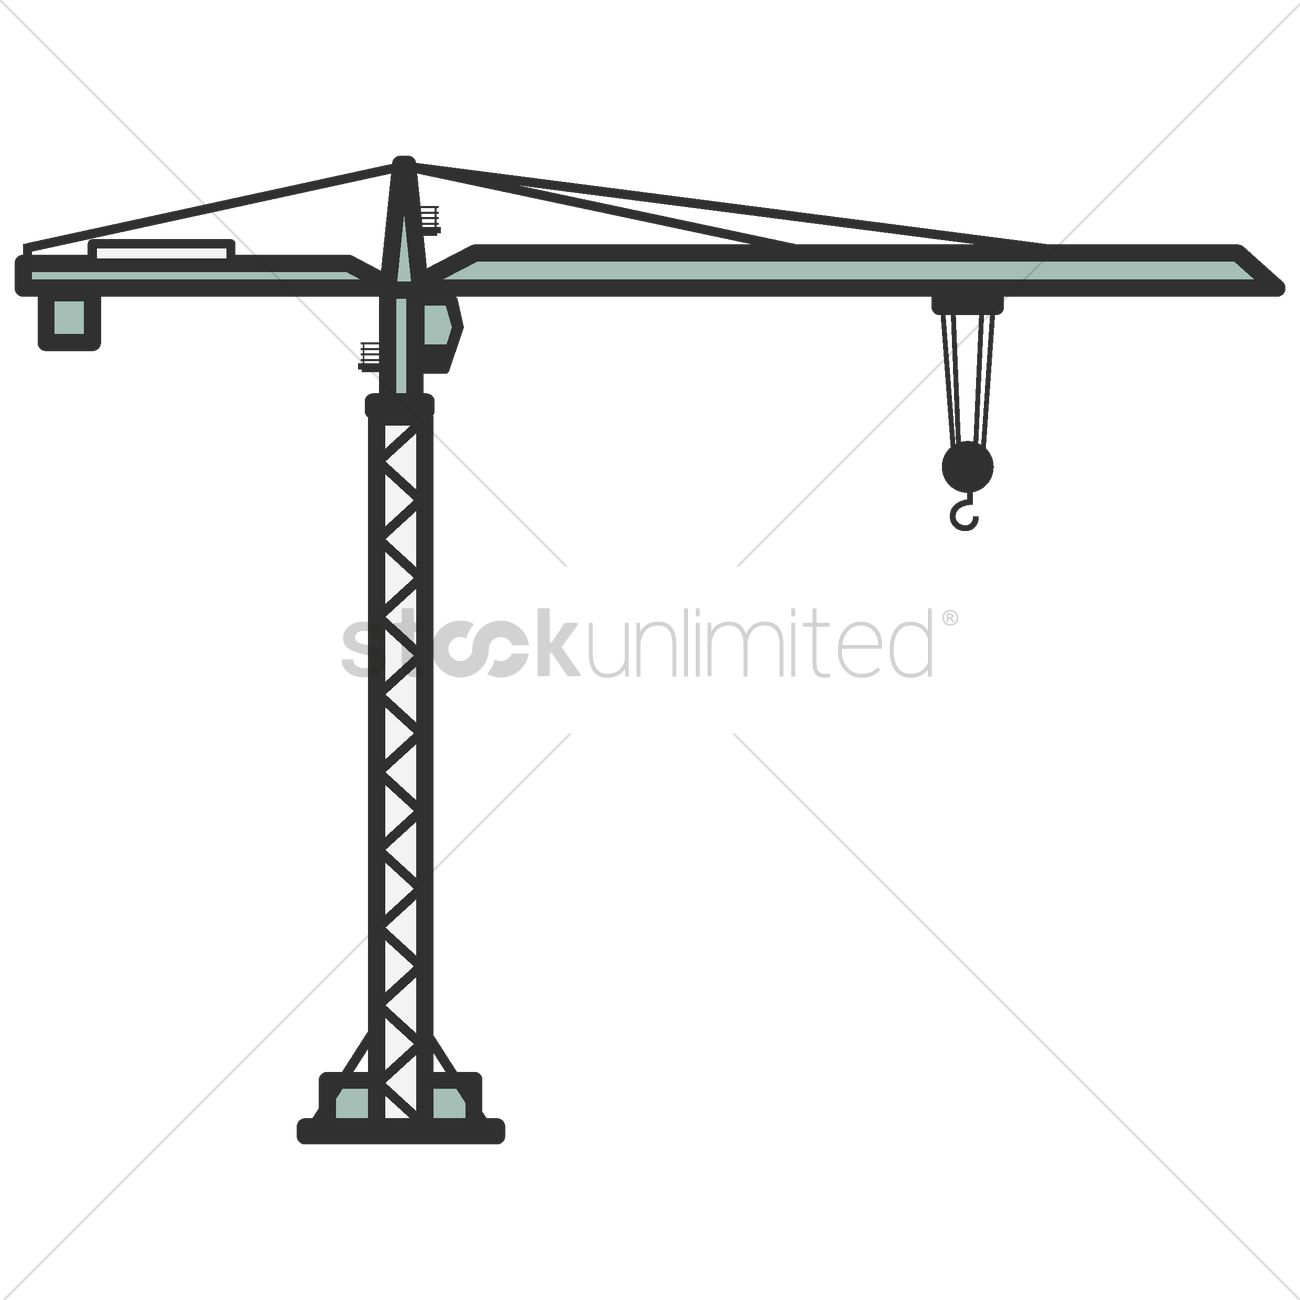 1300x1300 Tower Crane Vector Image